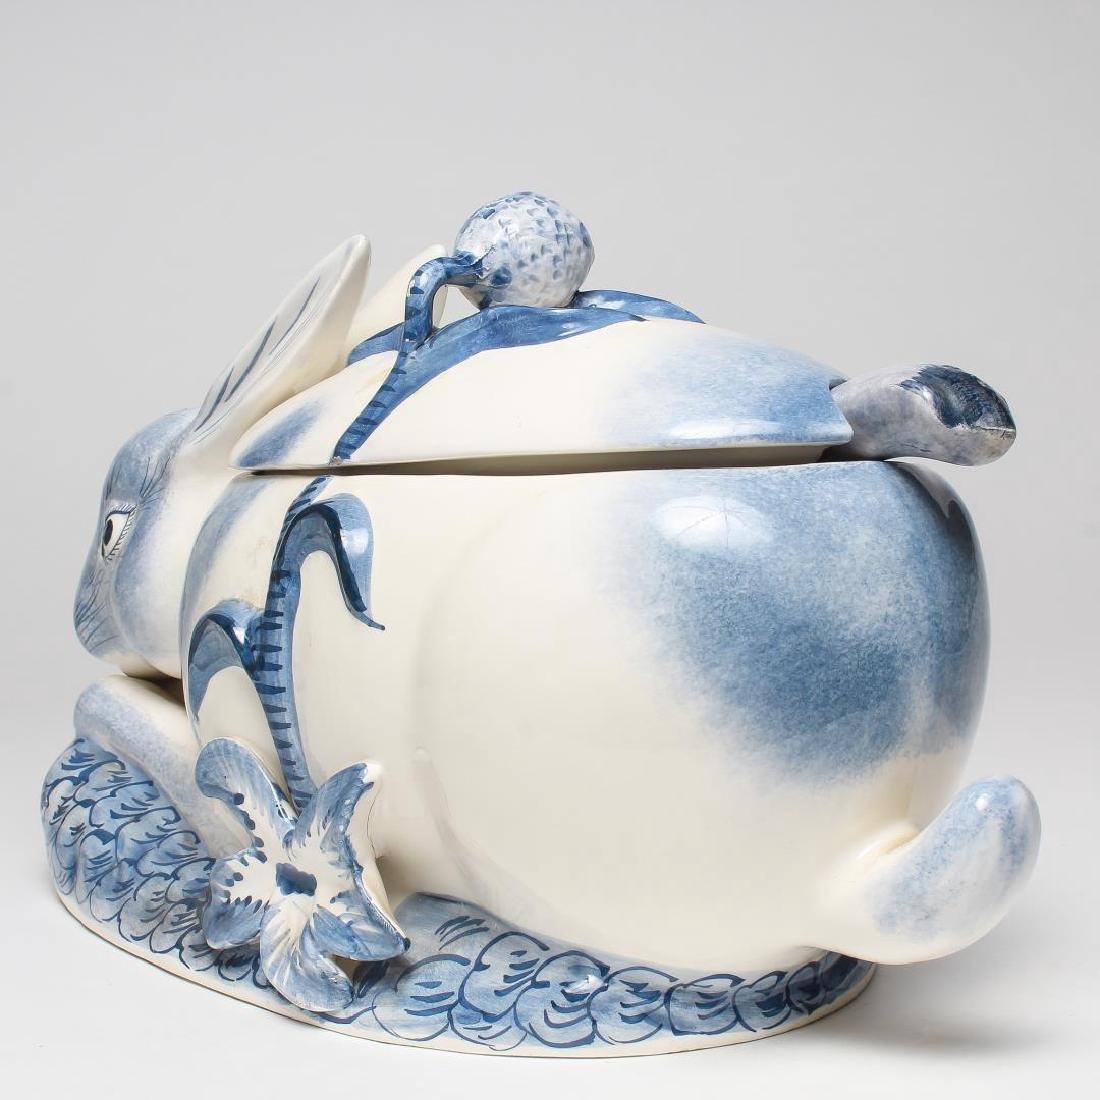 Italian Porcelain Rabbit-Form Tureen & Ladle - 4